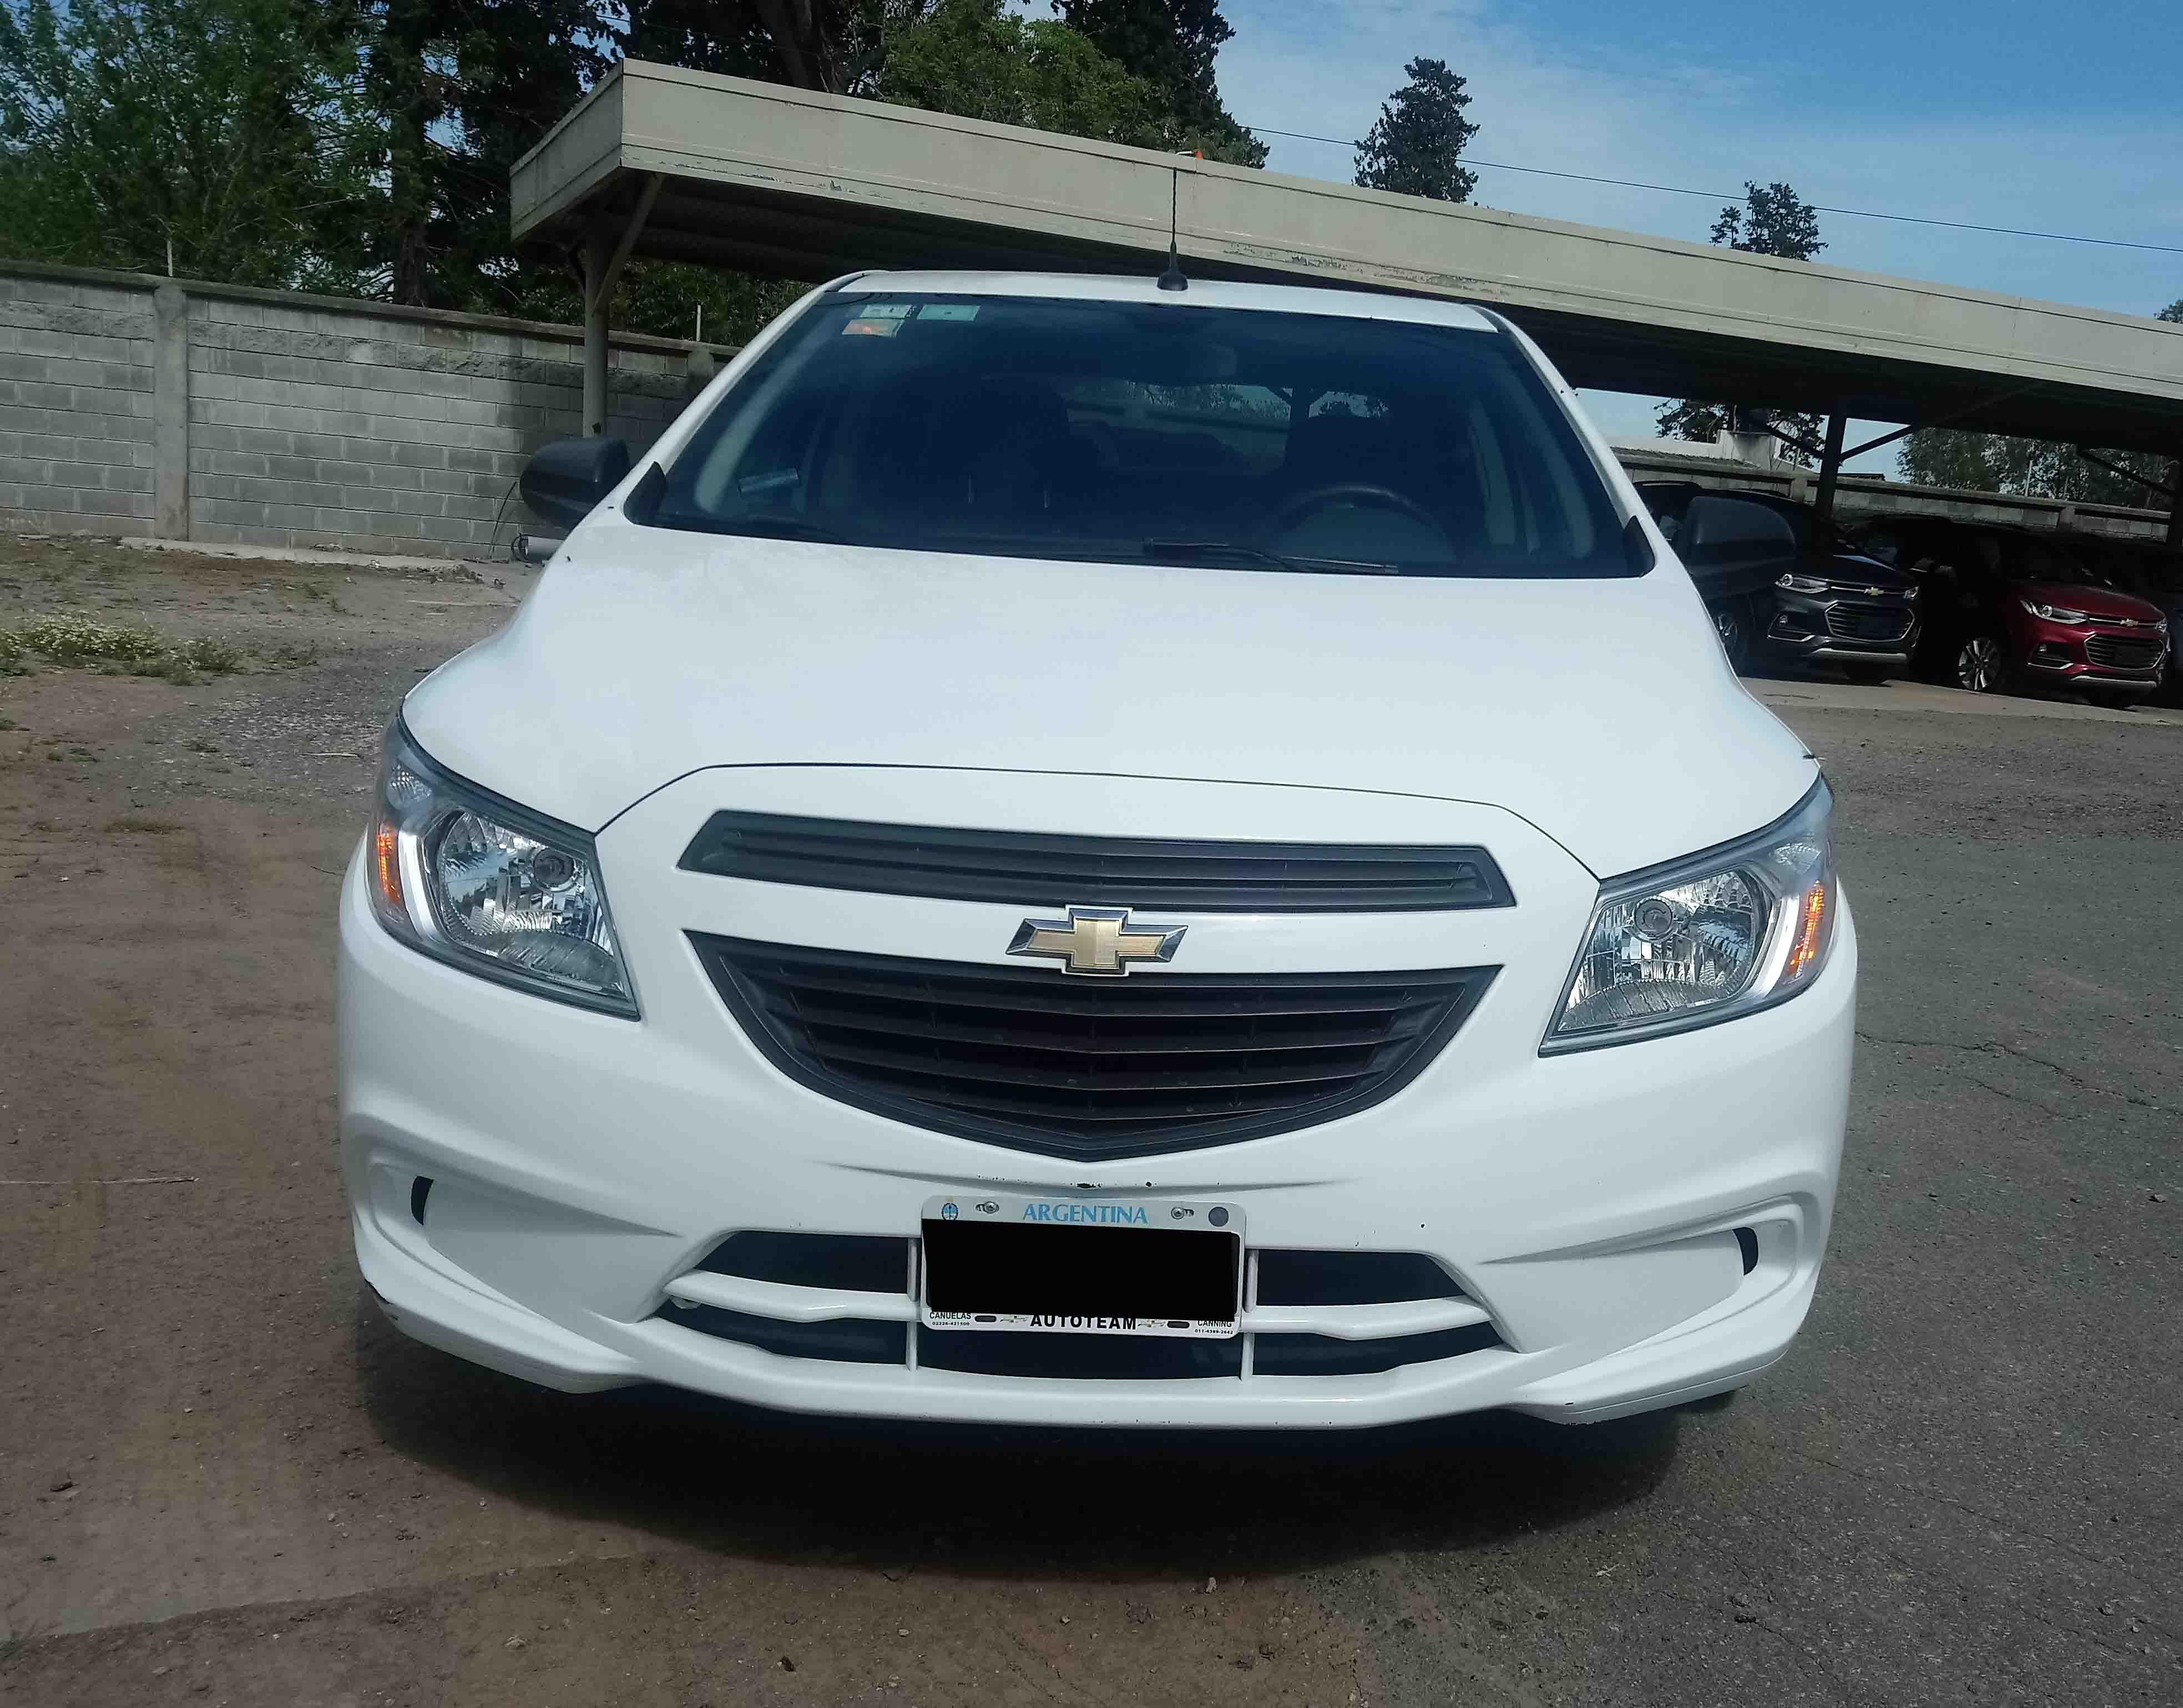 2015 Chevrolet Prisma LT 1.4L